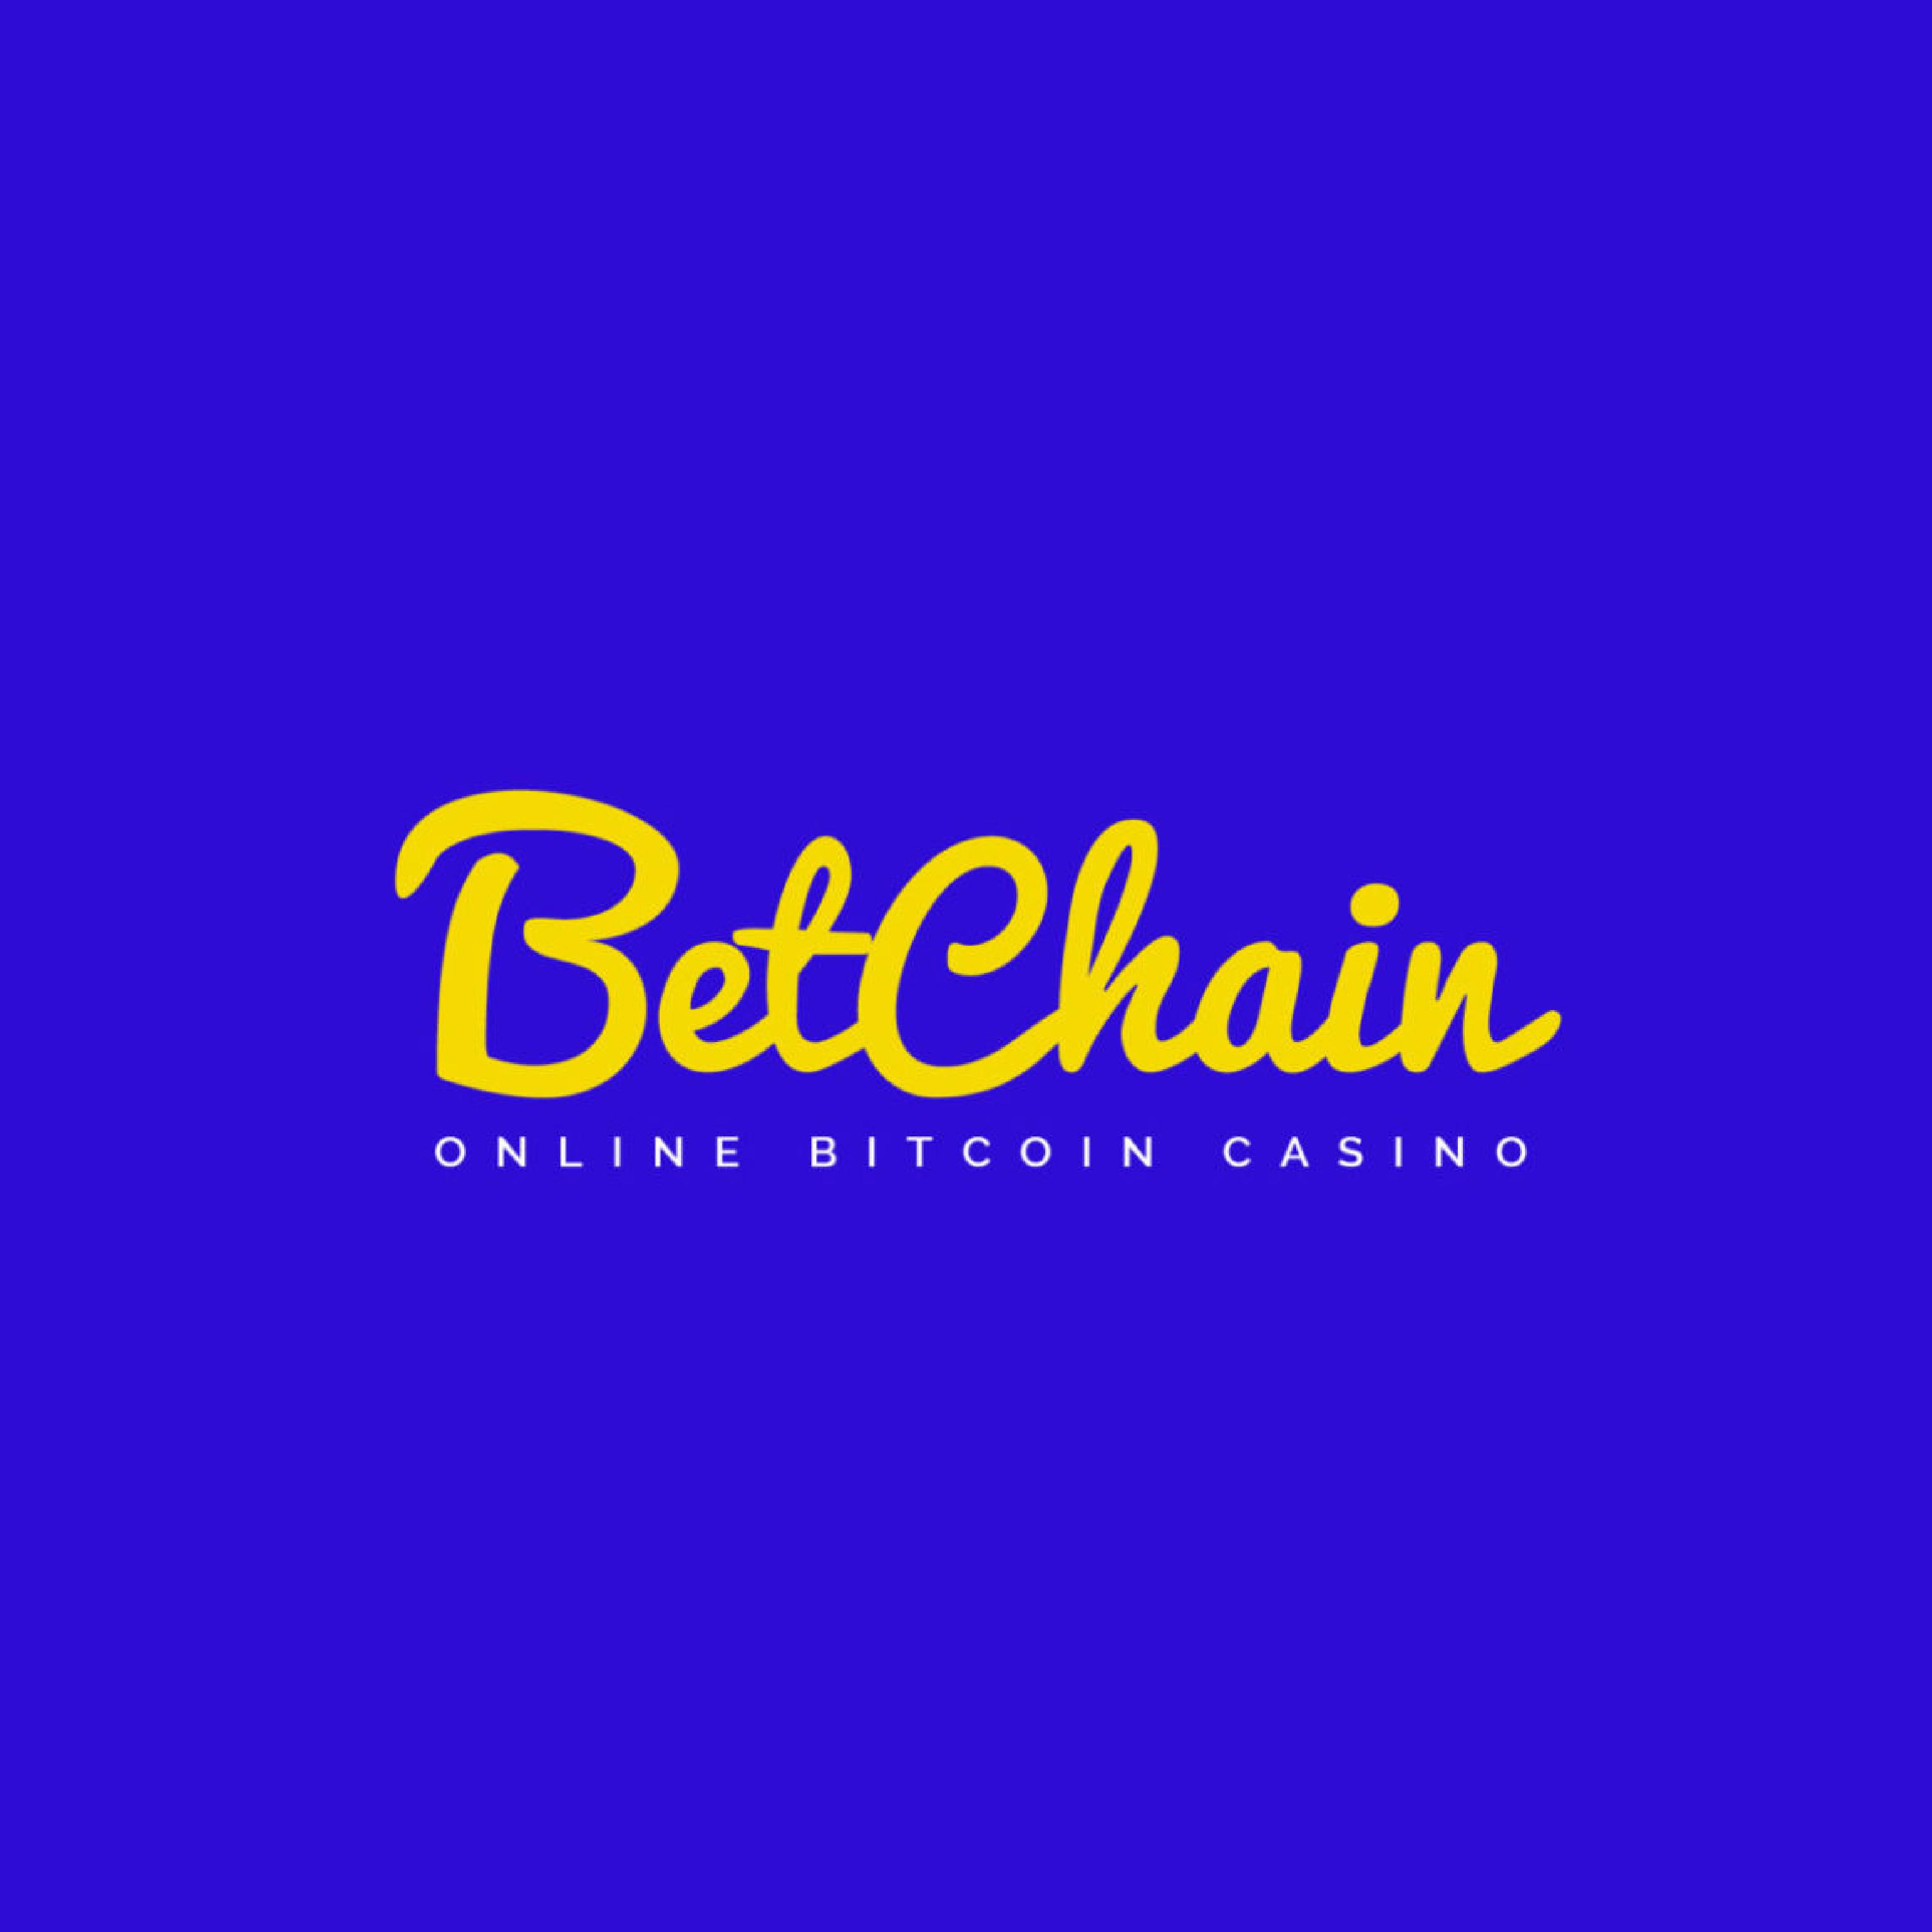 Best casino payout percentage